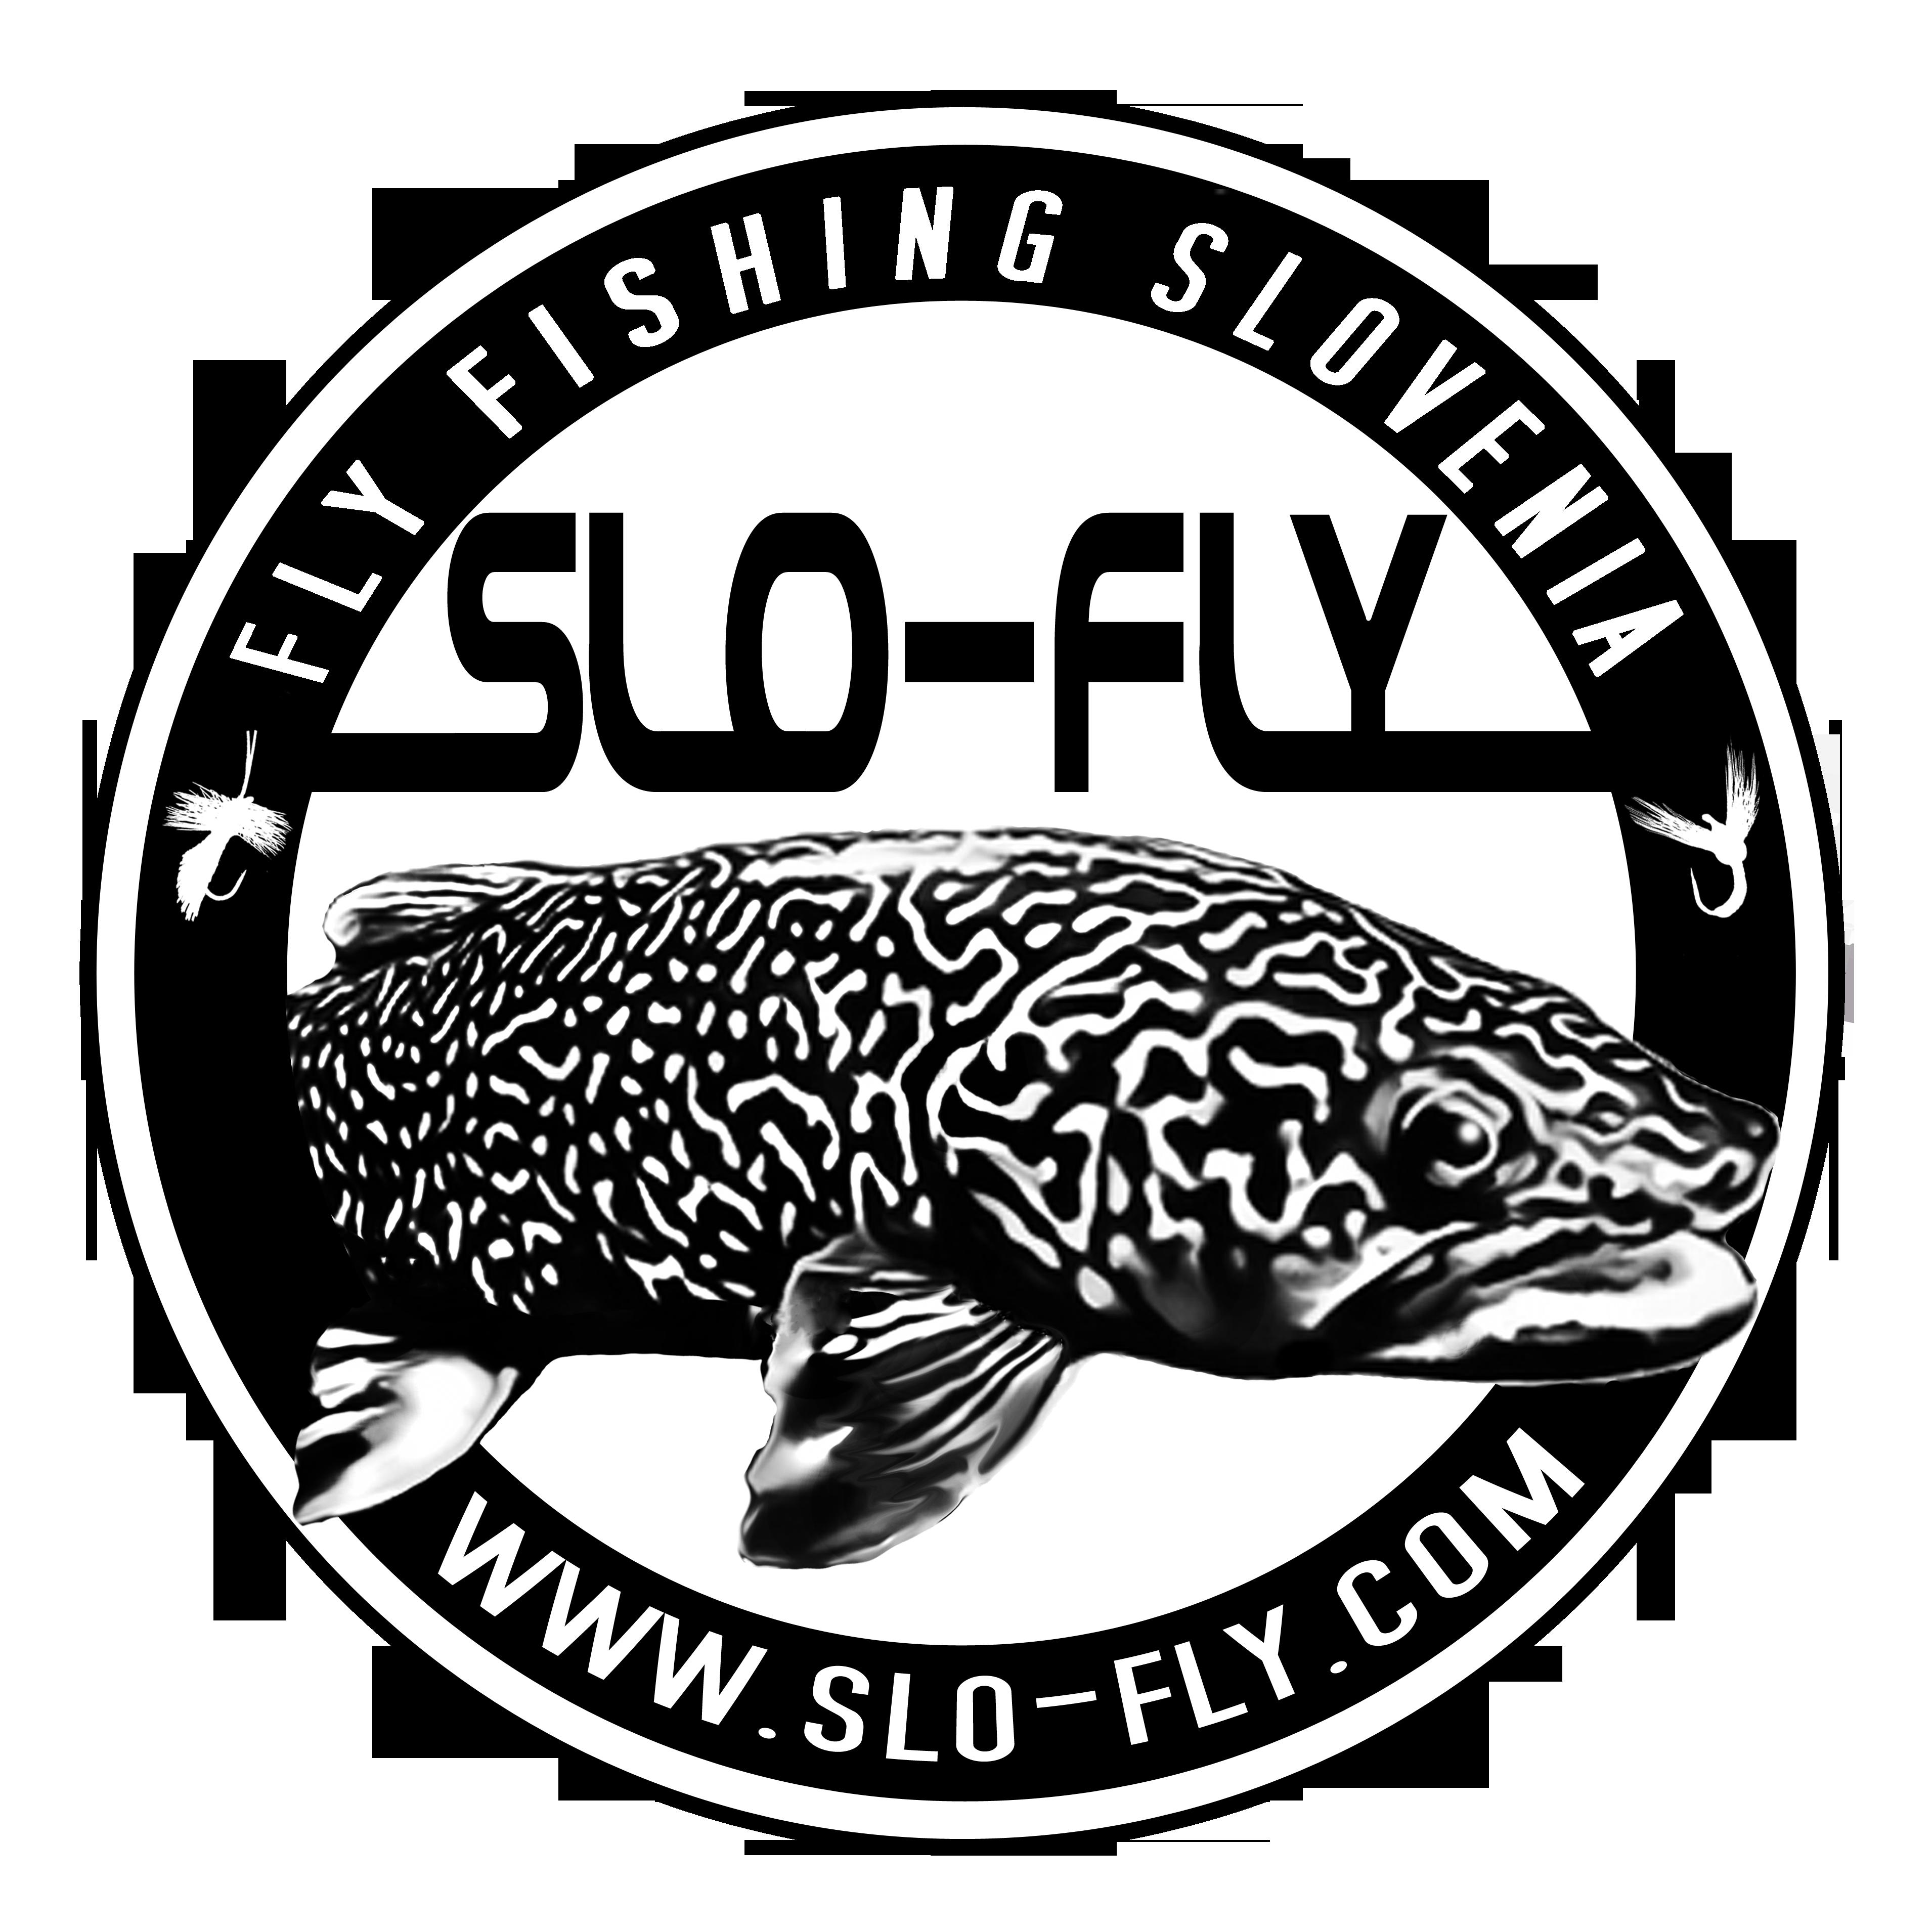 Rainbow fish black and white clipart image freeuse download slo-fly | FAQ image freeuse download